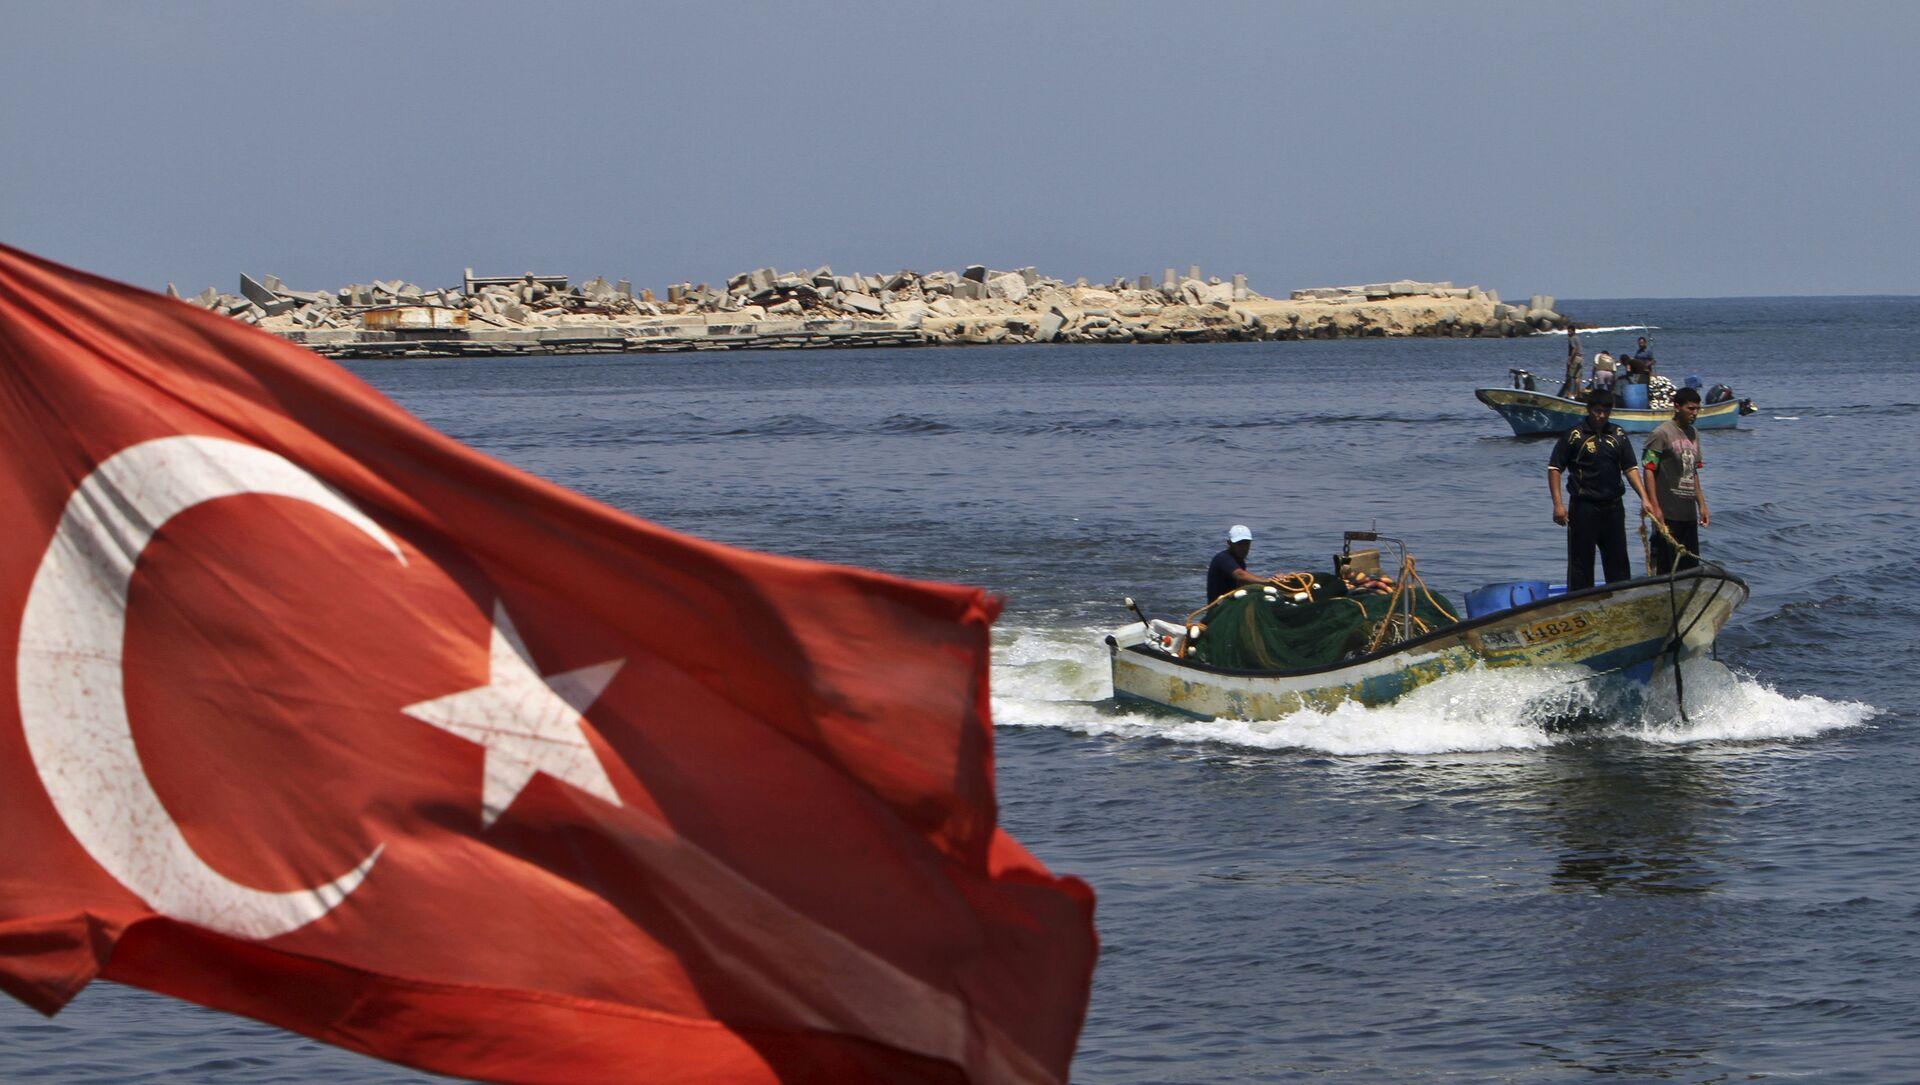 La bandiera della Turchia - Sputnik Italia, 1920, 04.04.2021